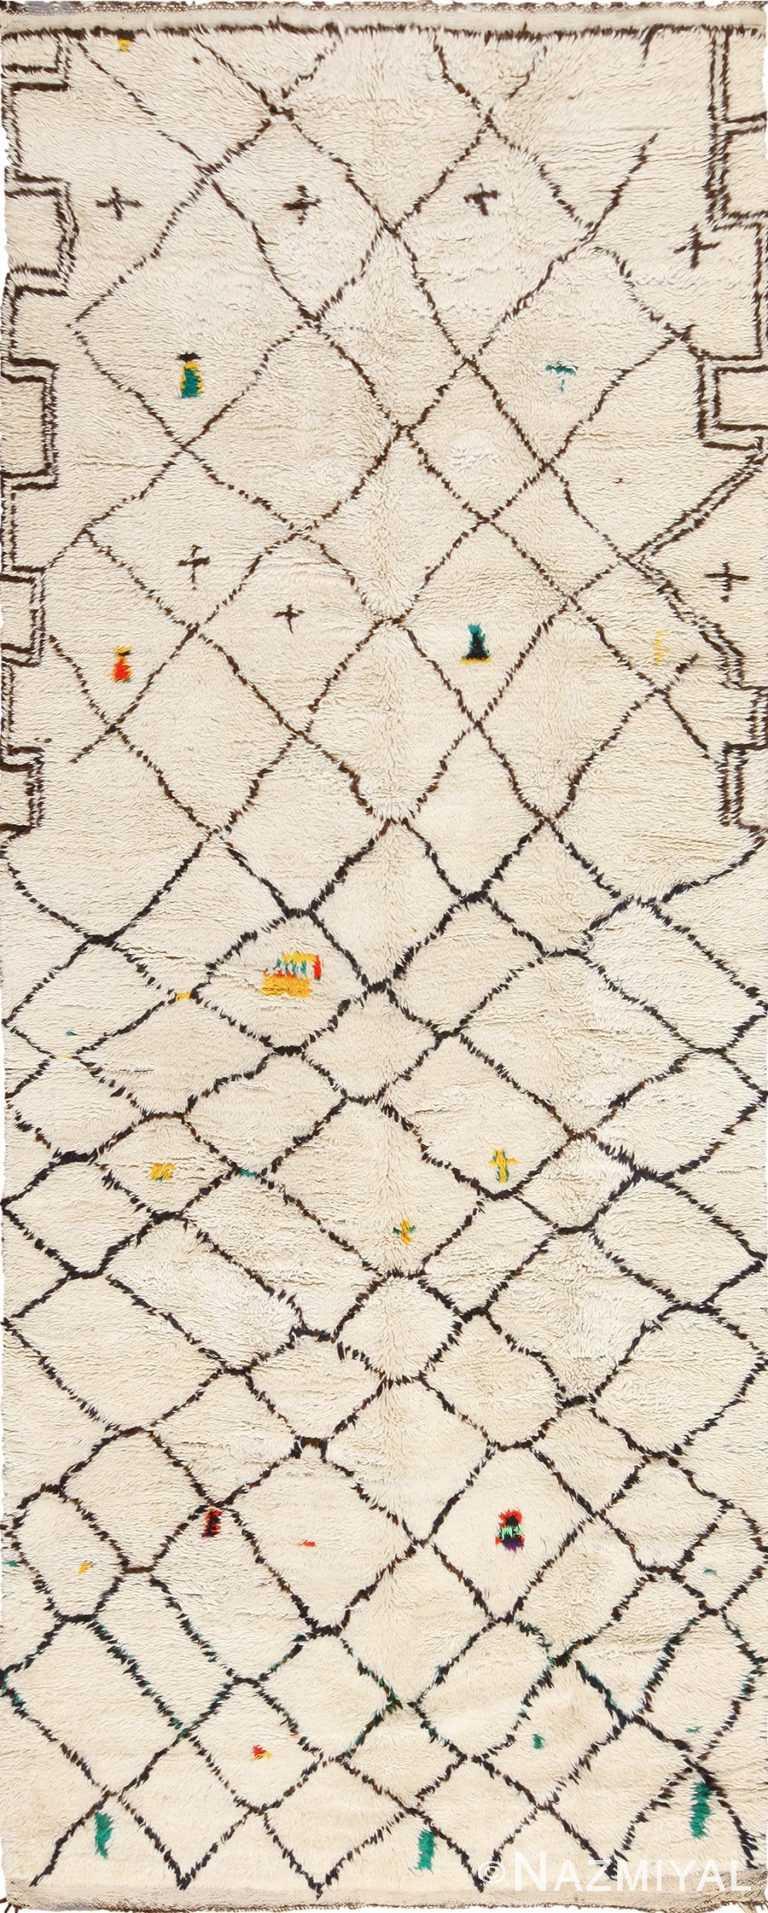 Vintage Shaggy Beni Ourain Moroccan Berber Carpet 49885 - Nazmiyal